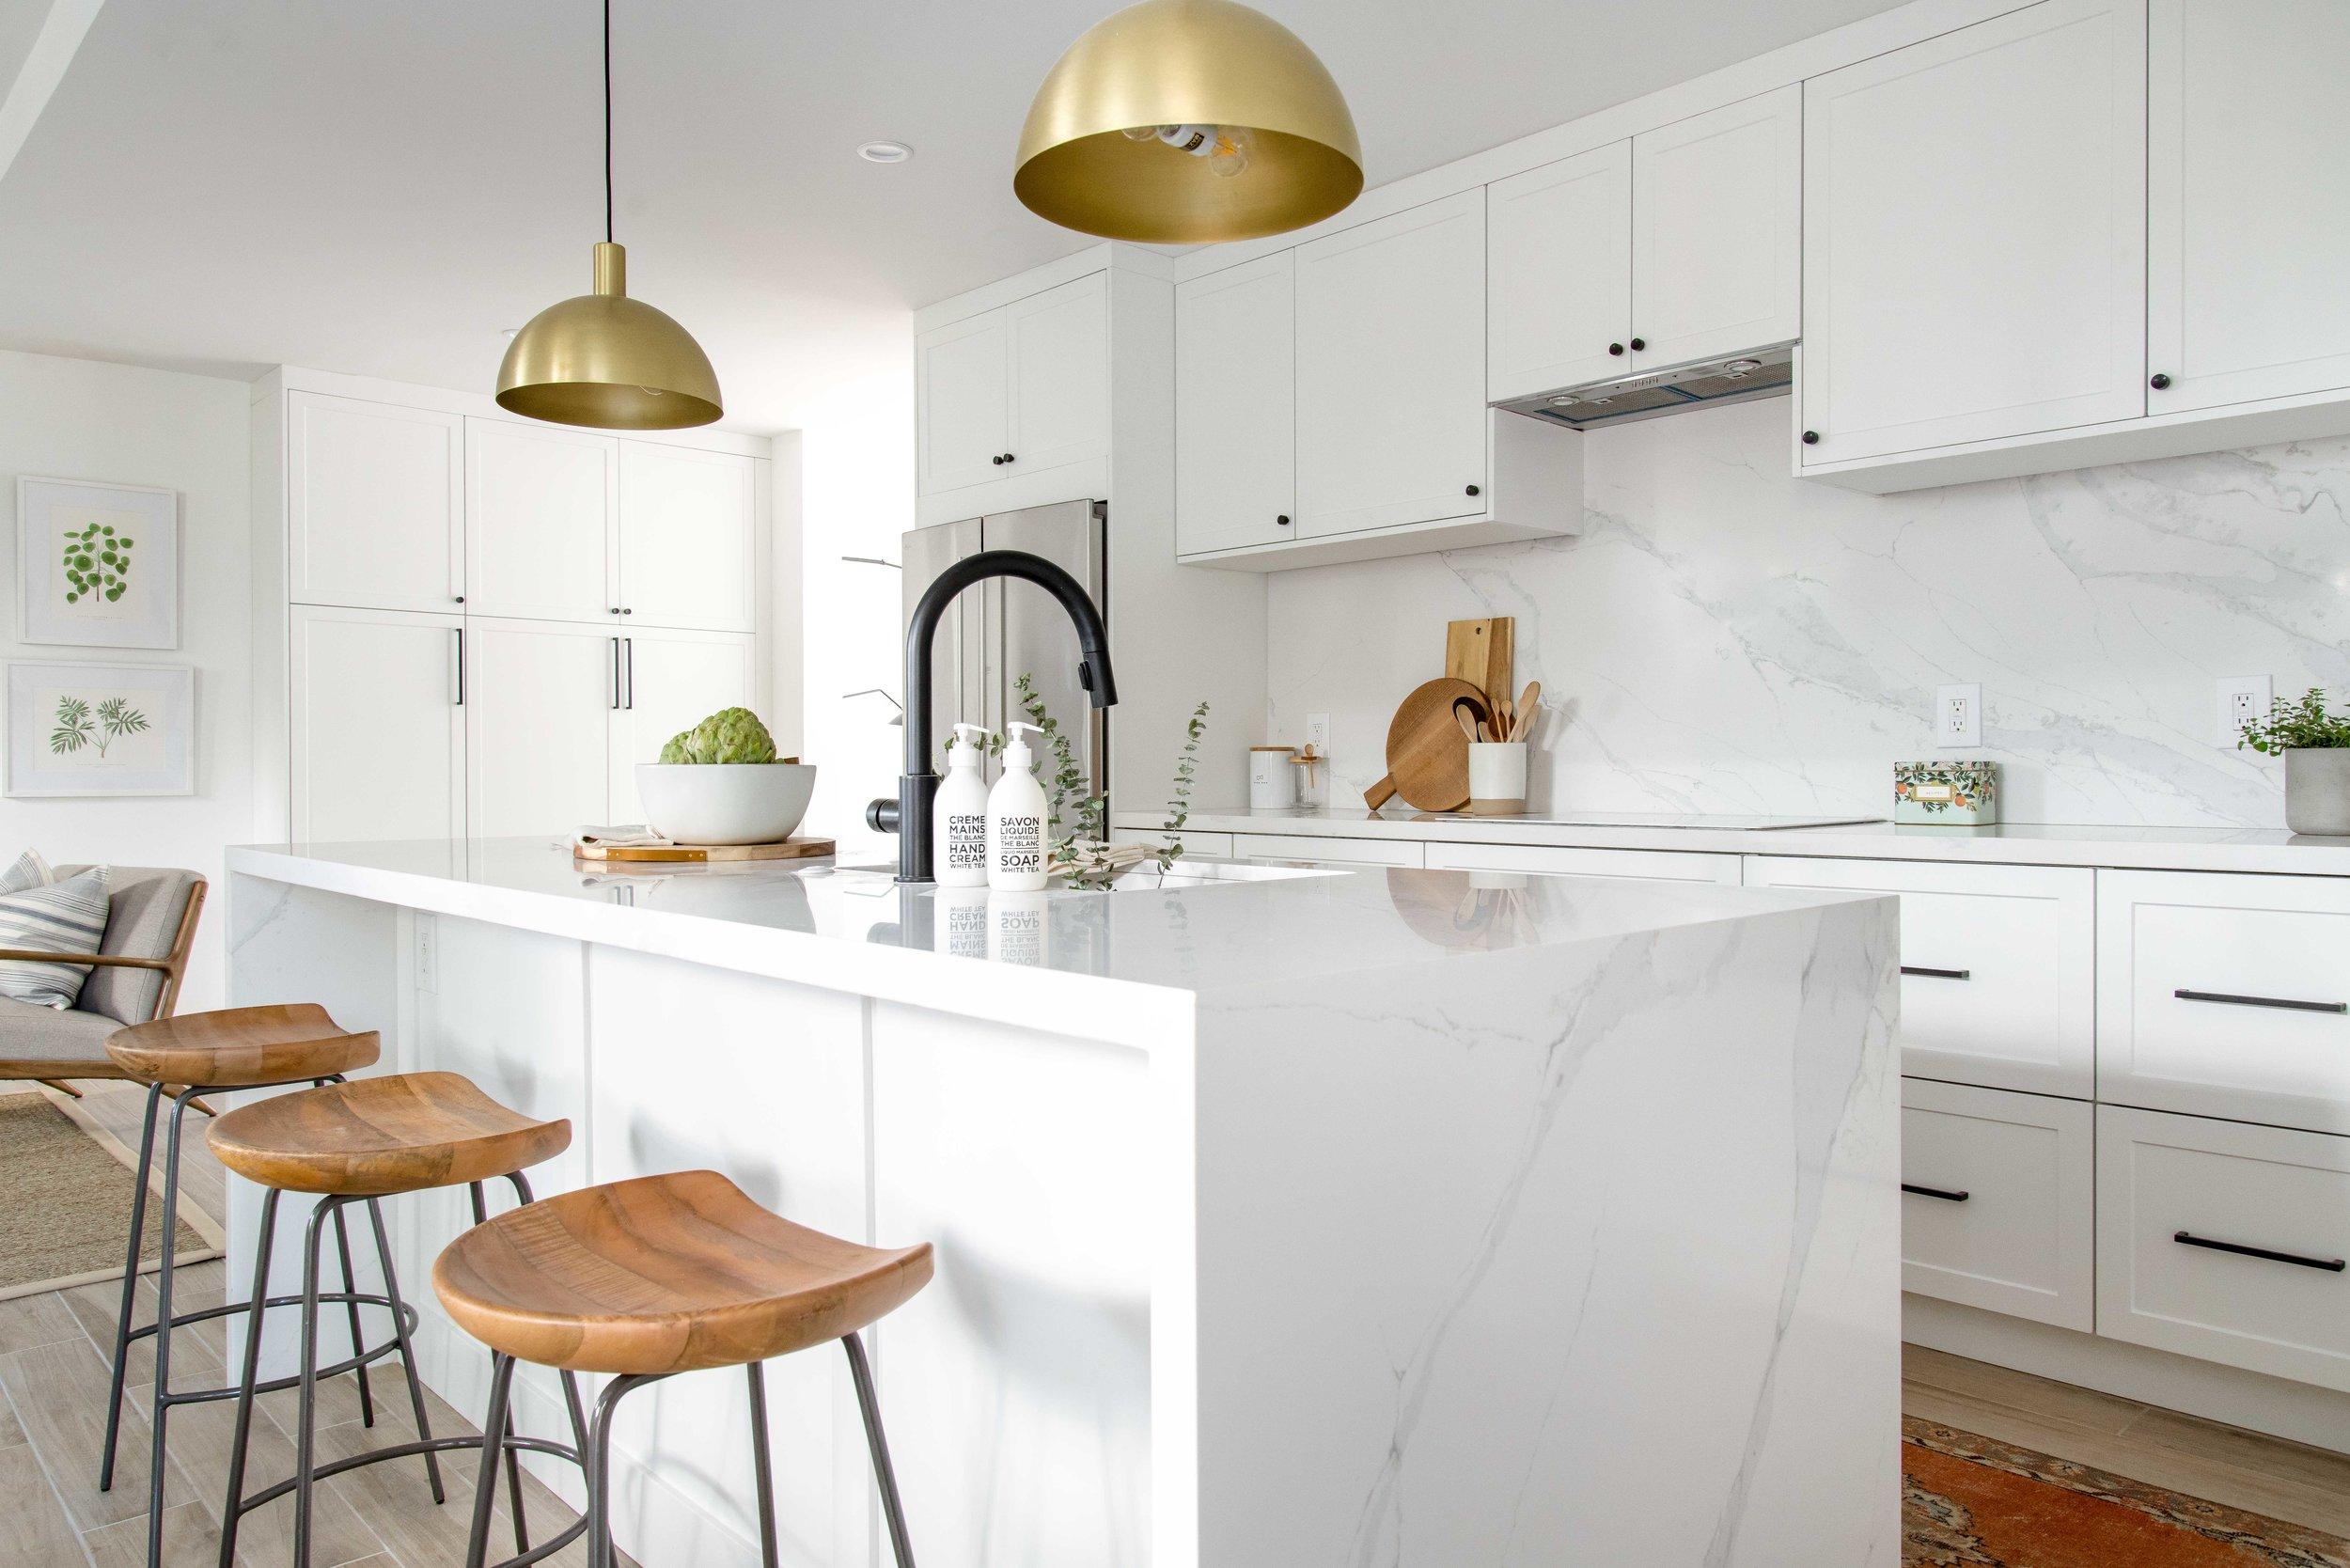 Sonder Stays Miami Interior Design Photographer Lifestyle Home Interiors Photography-1.jpg